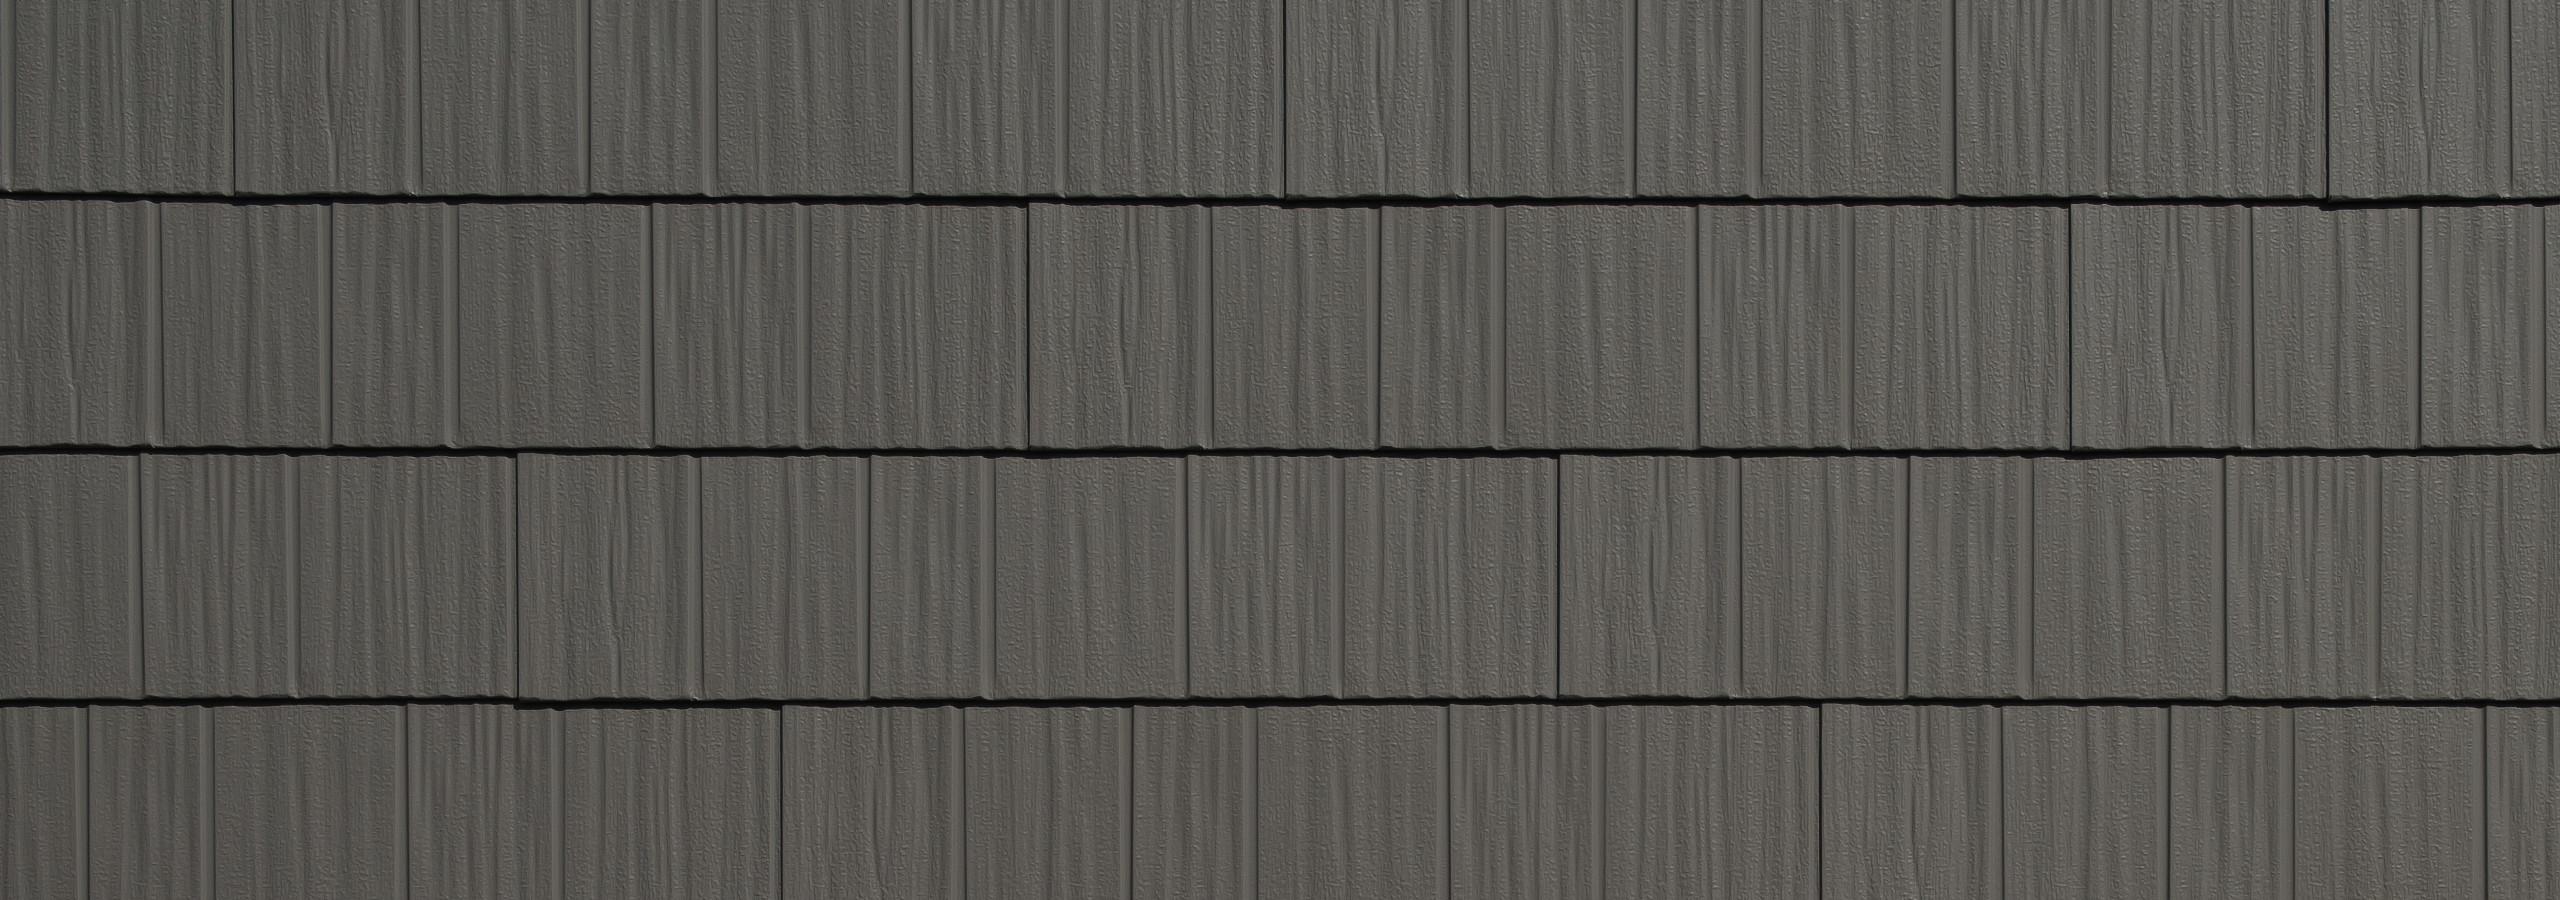 Charcoal gray/grey steel shake roofing